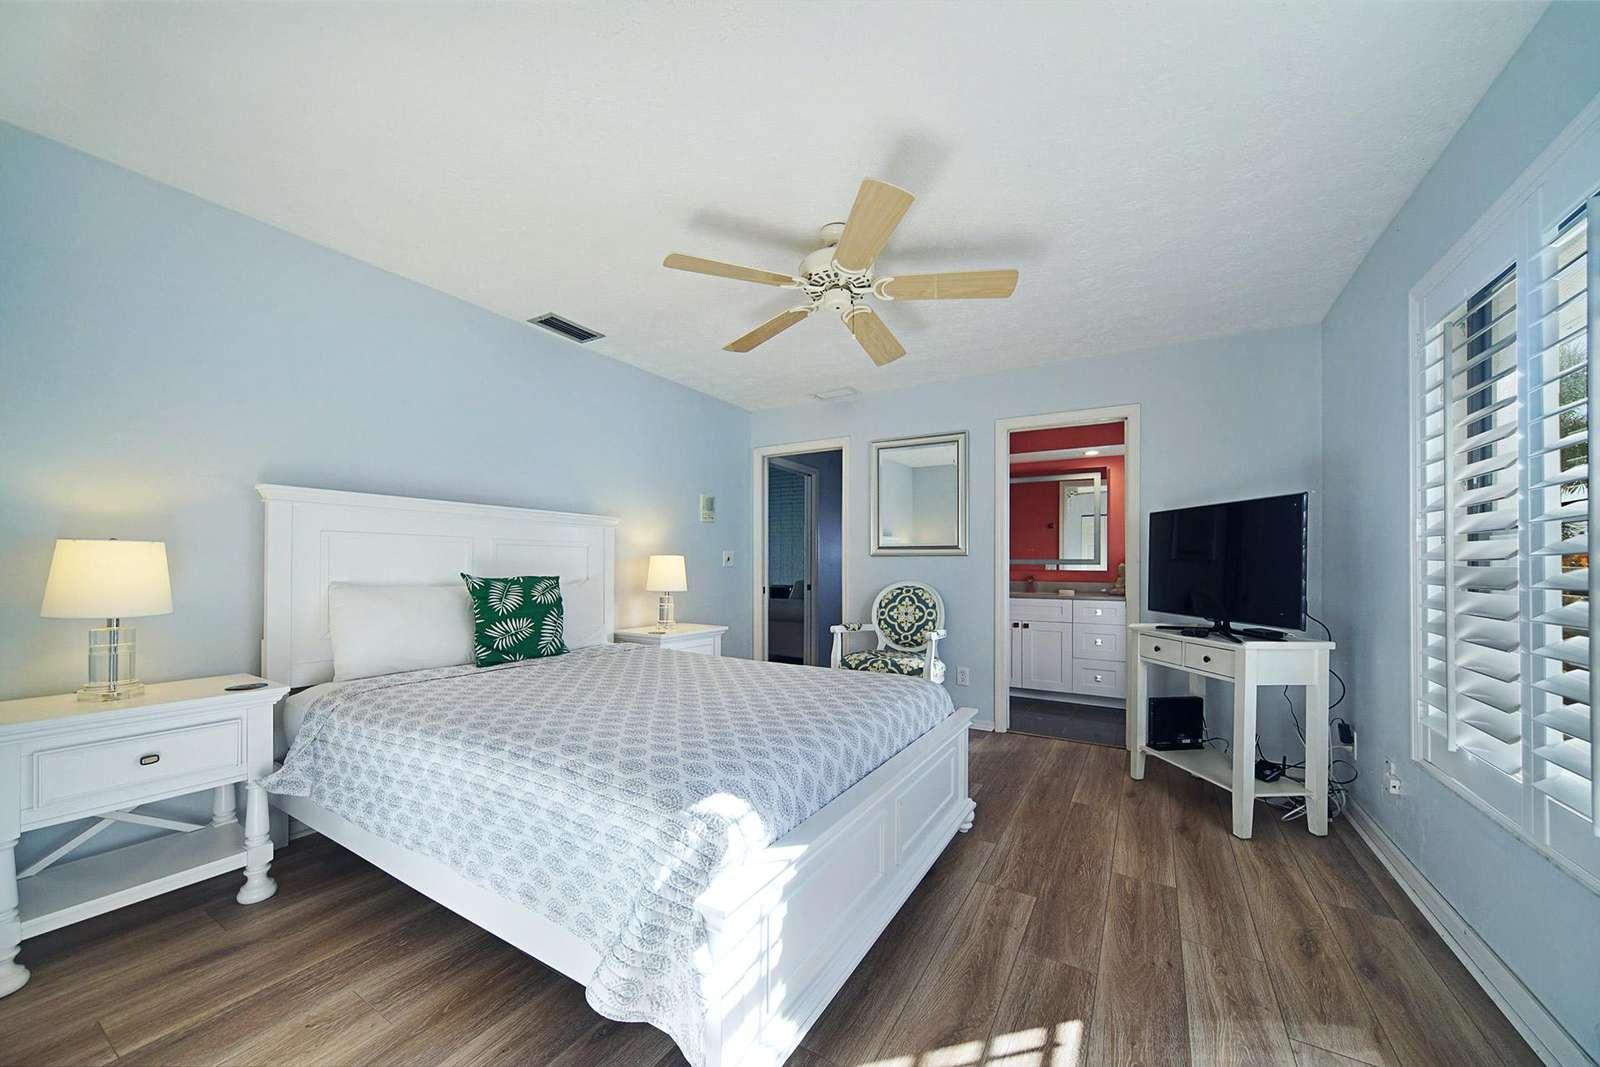 Wischis Florida Home - Ferienhaus Cape Coral I Hausverwaltung I Immobilien